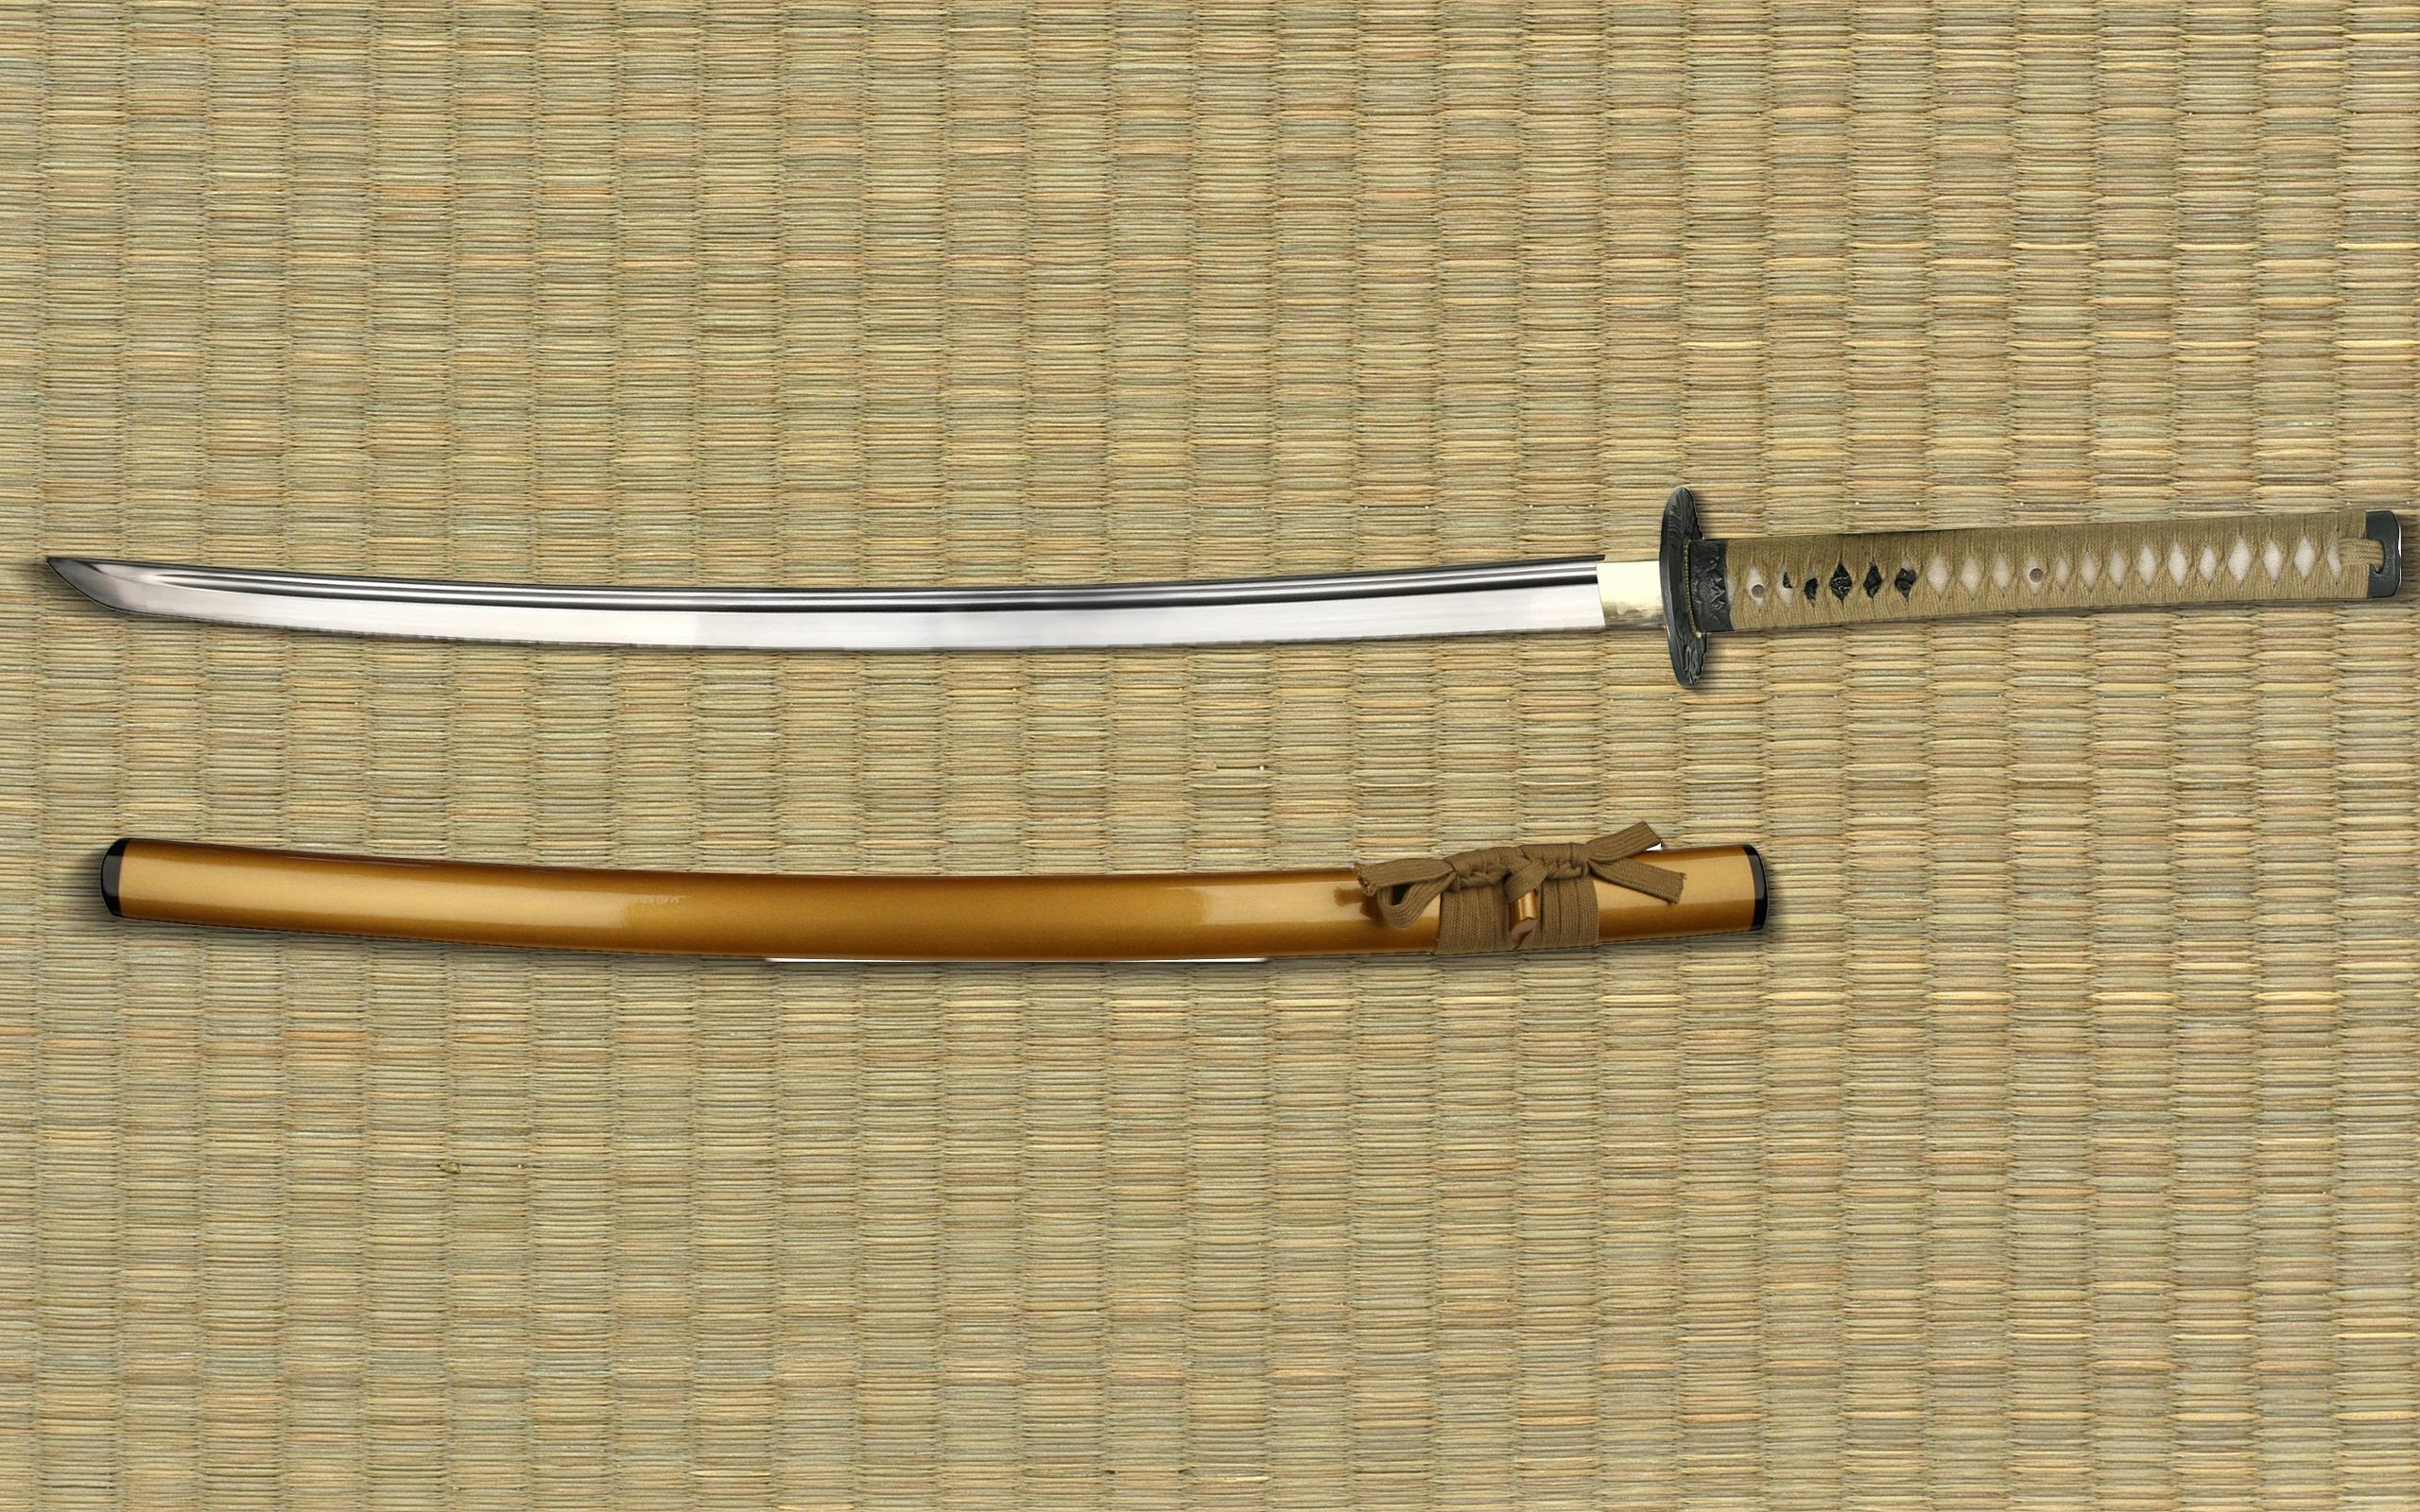 Samurai Wallpaper Iphone 6 Weapons Samurai Sword Katana Wallpaper